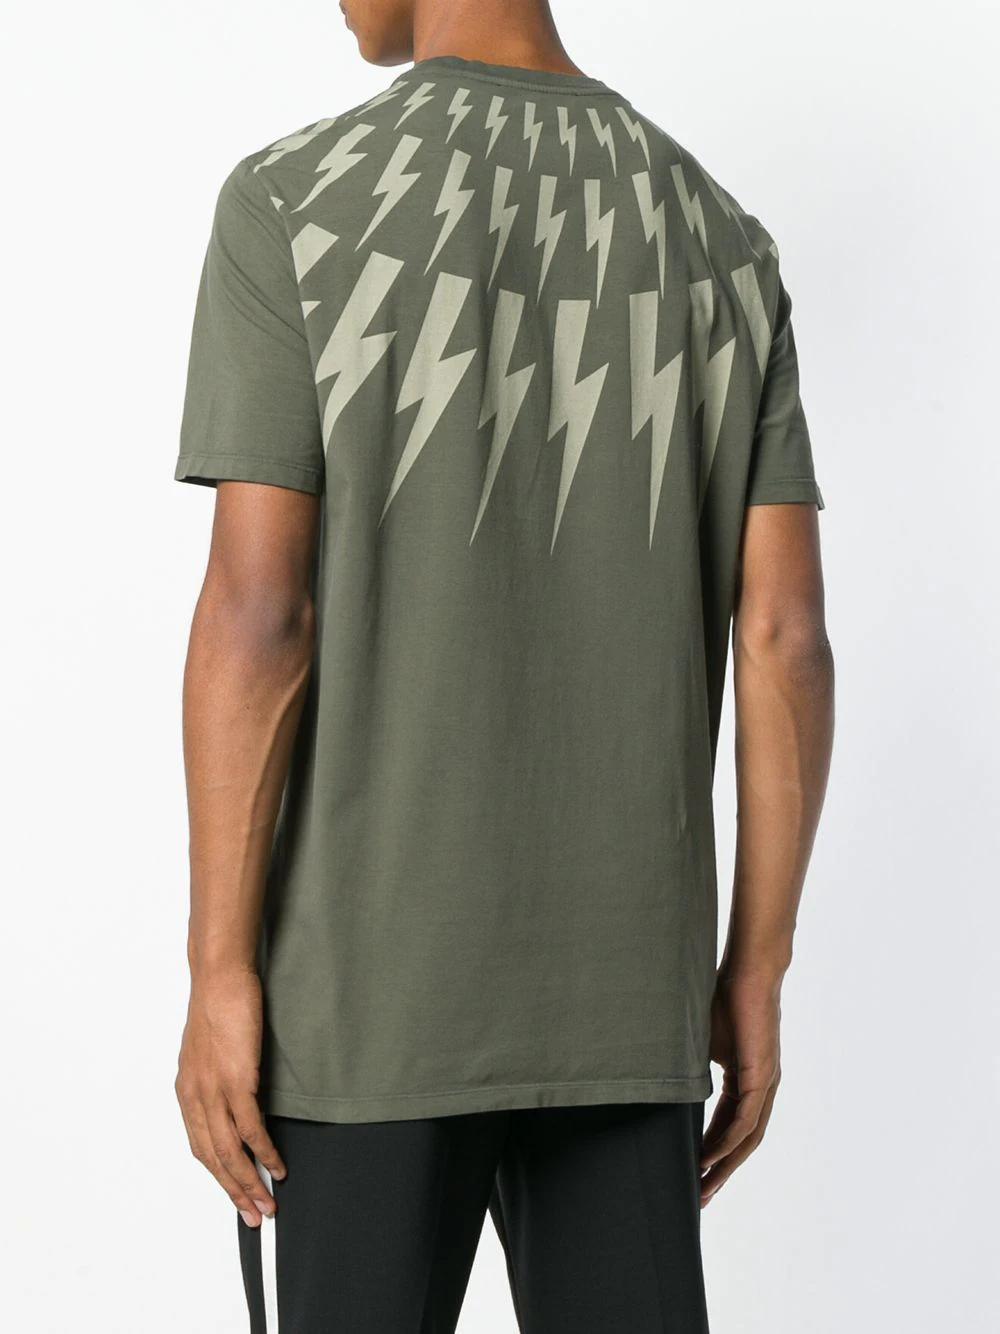 Neil Barrett | футболка с принтом молний | Clouty